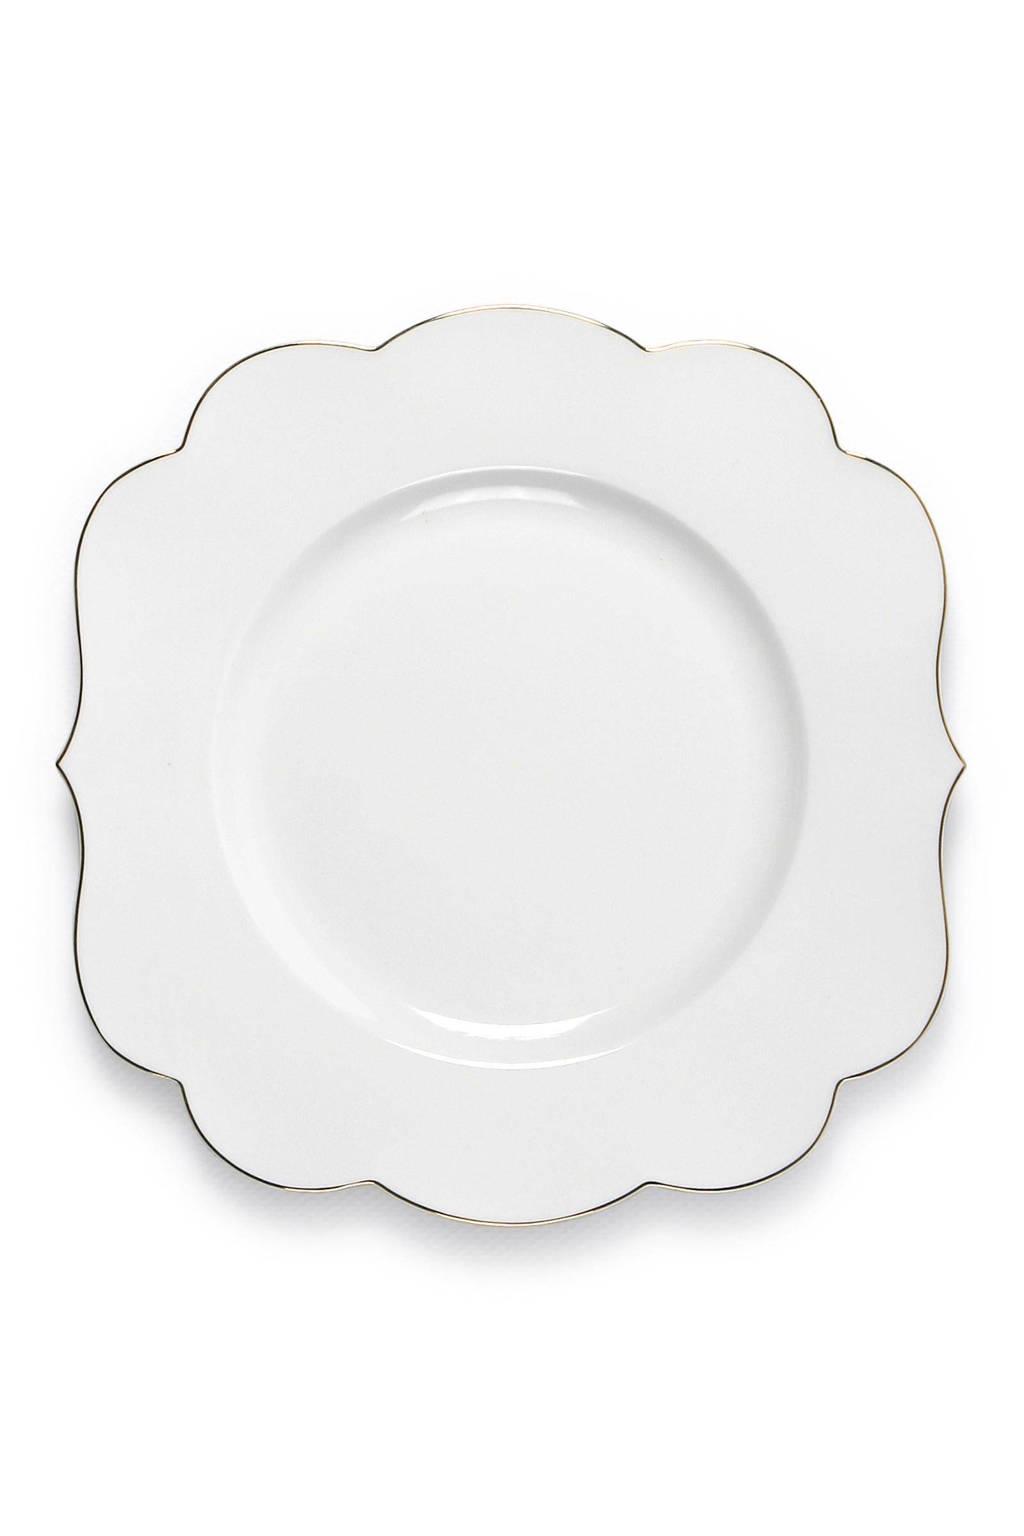 Pip Studio Royal White ontbijtbord (Ø23 cm), Wit